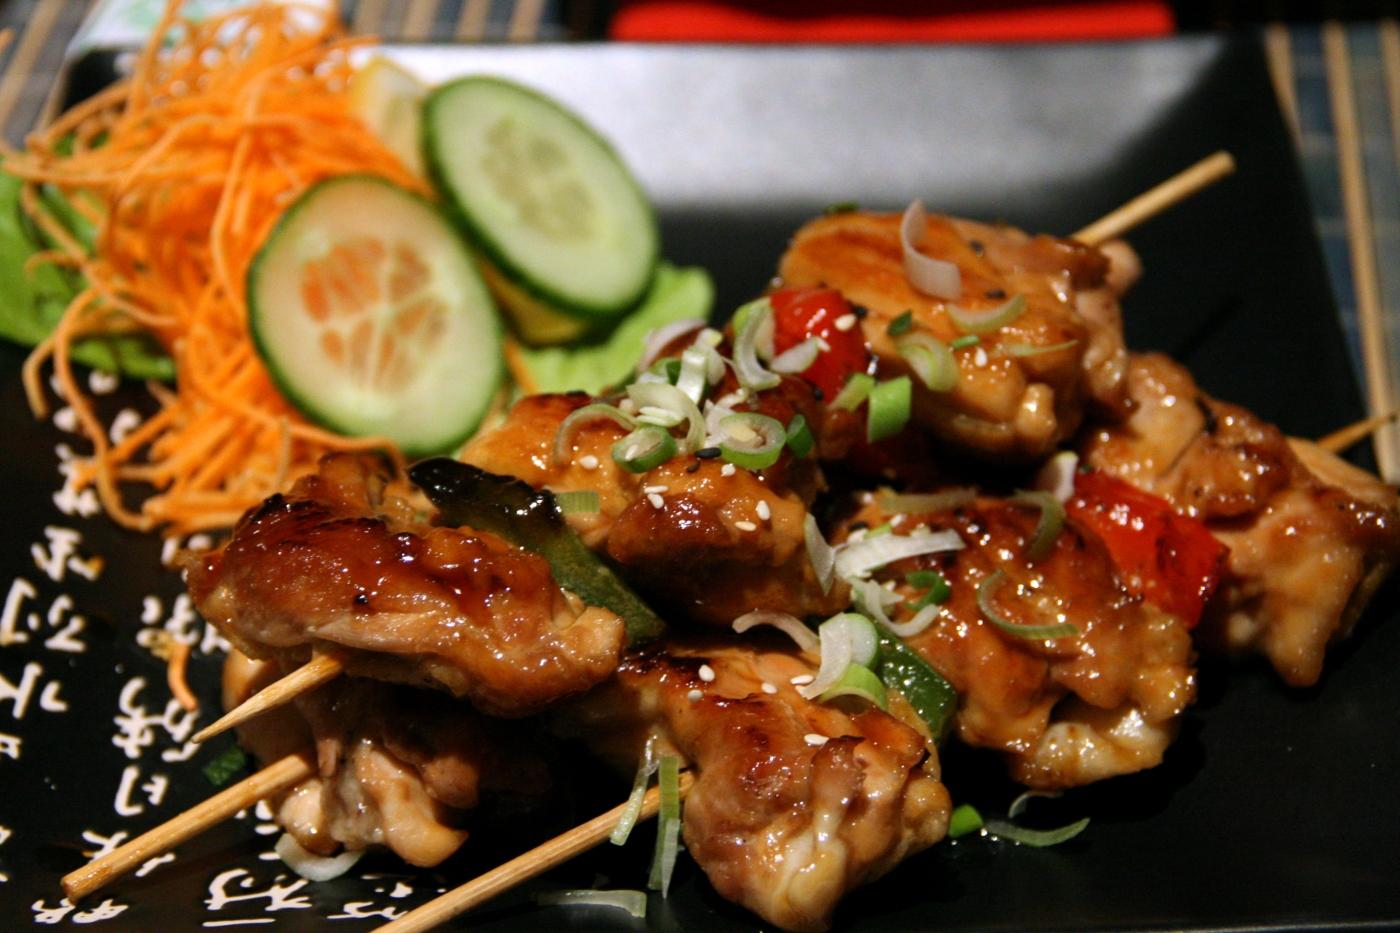 yakitori grill restaurant